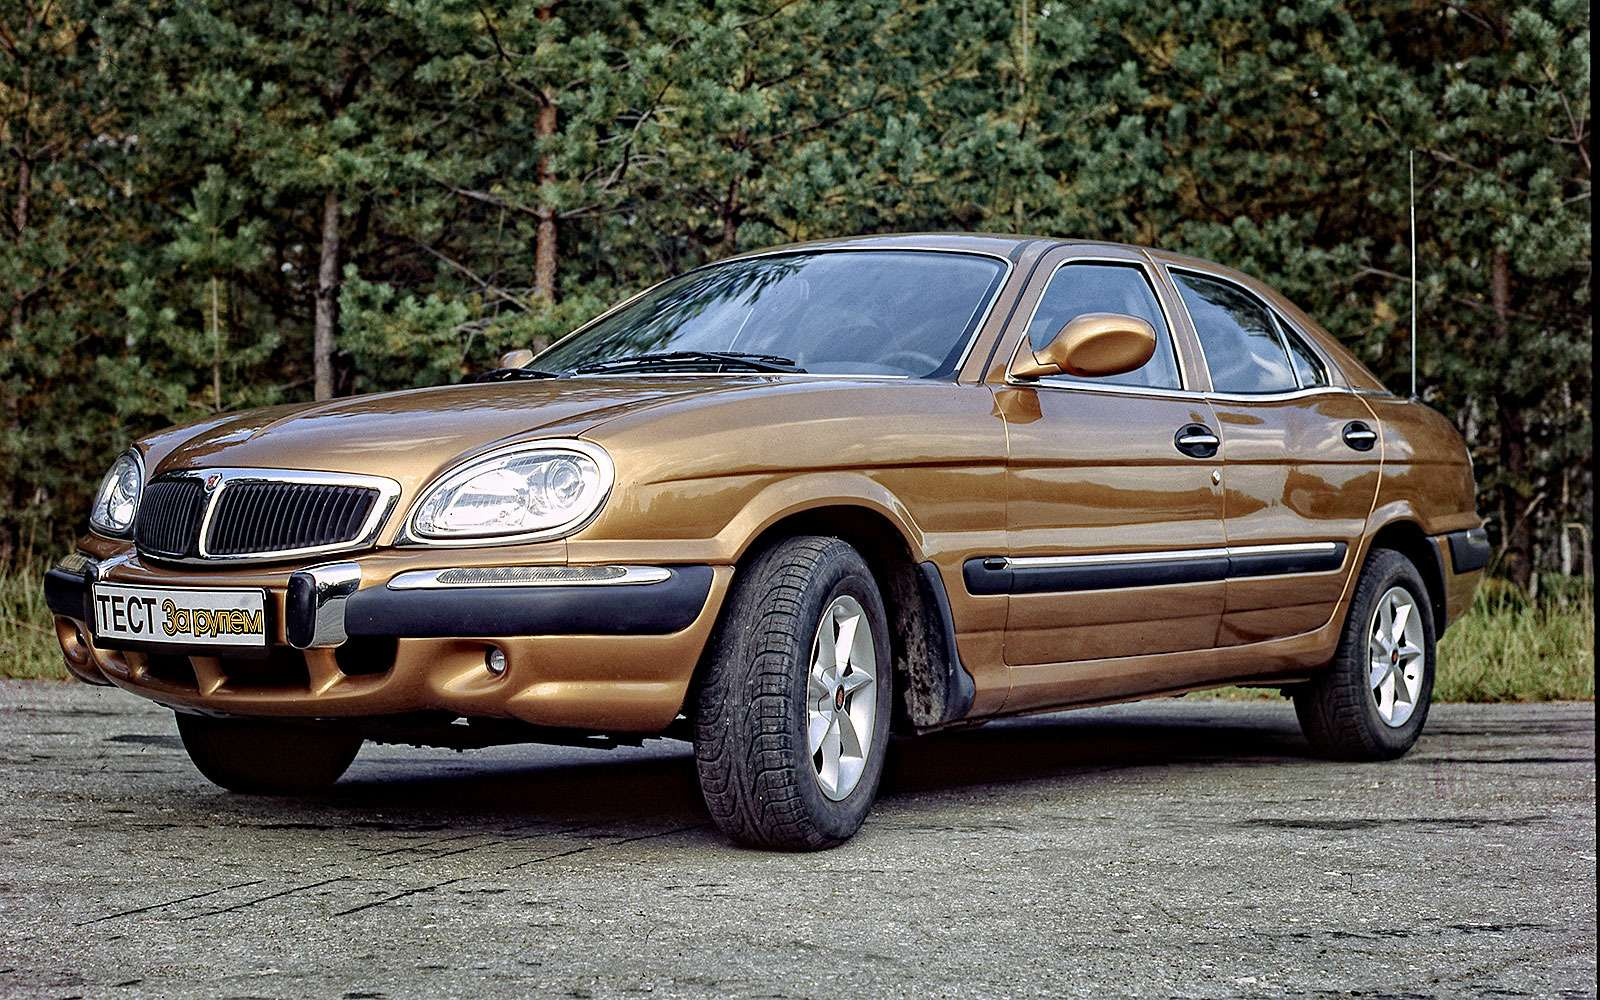 ГАЗ-3111 Волга, 1998г.